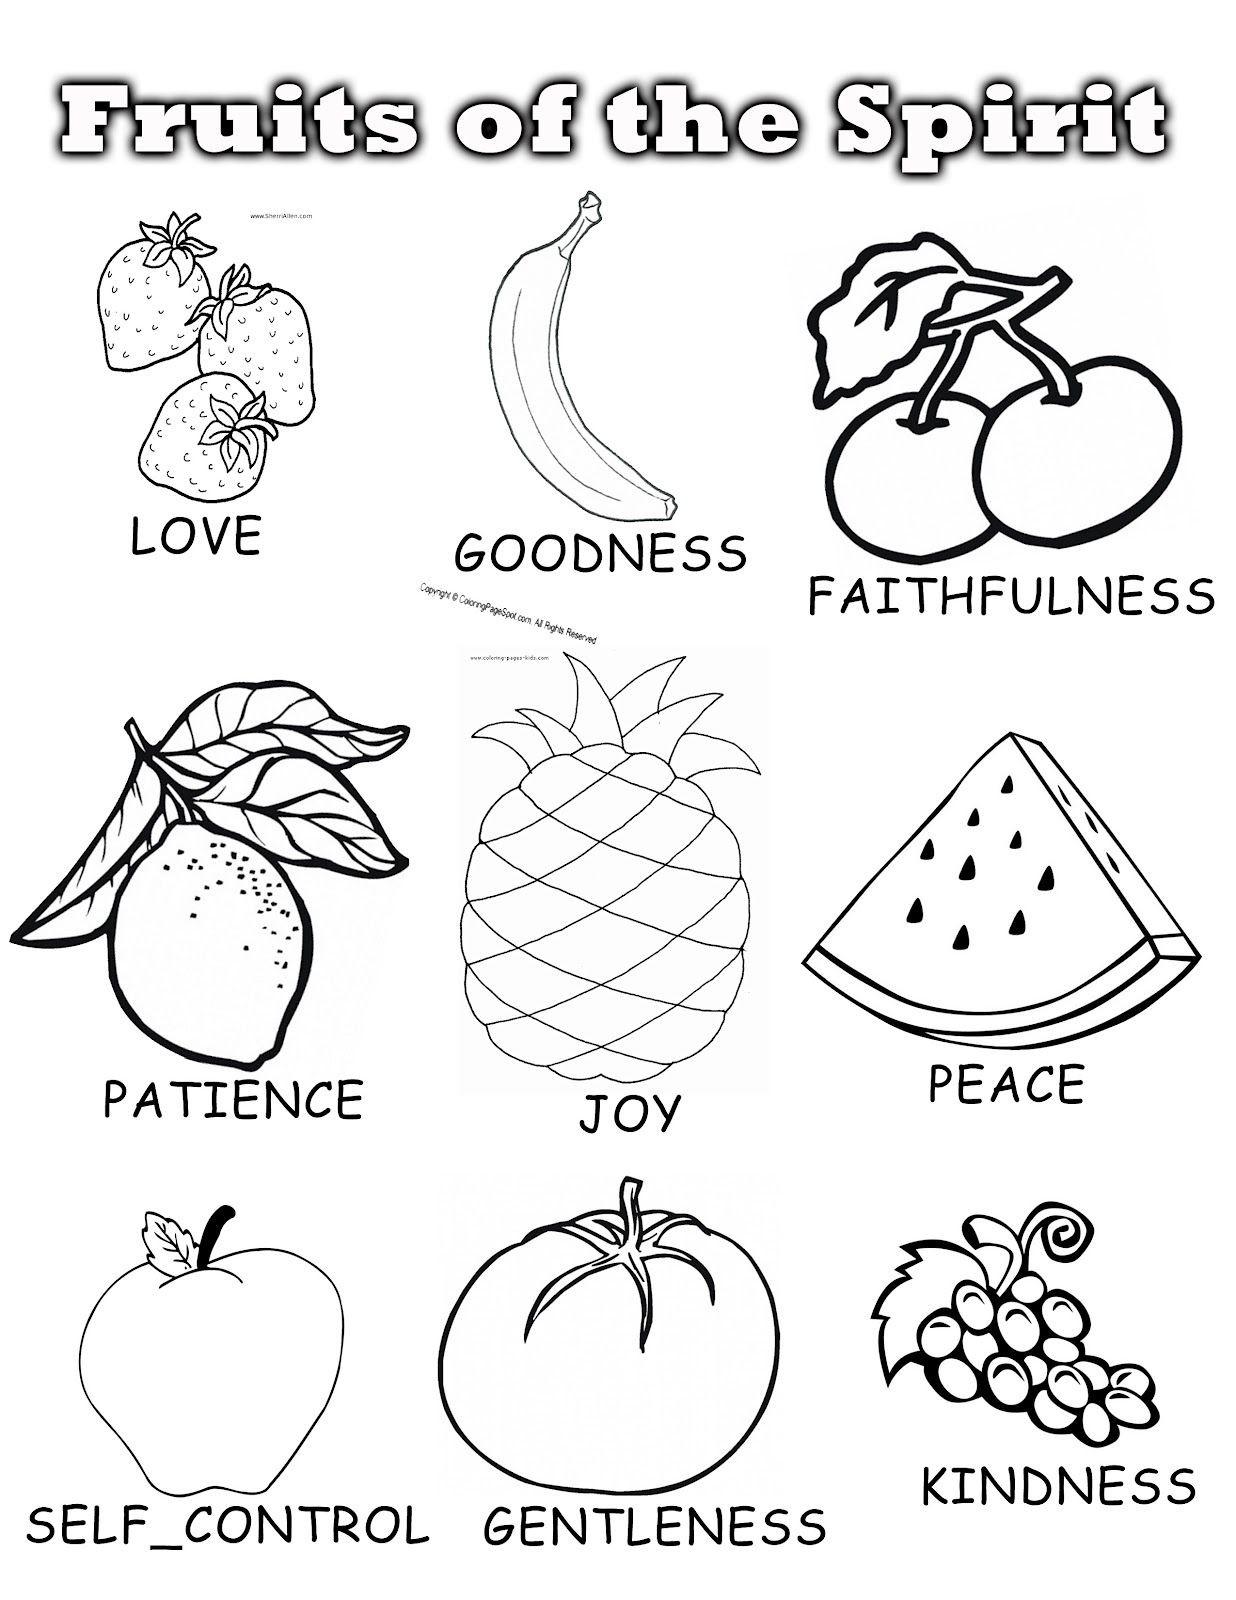 Fruits Of the Spirit Worksheet Fruits the Spirit Sunday School Unit Coloring Fruit